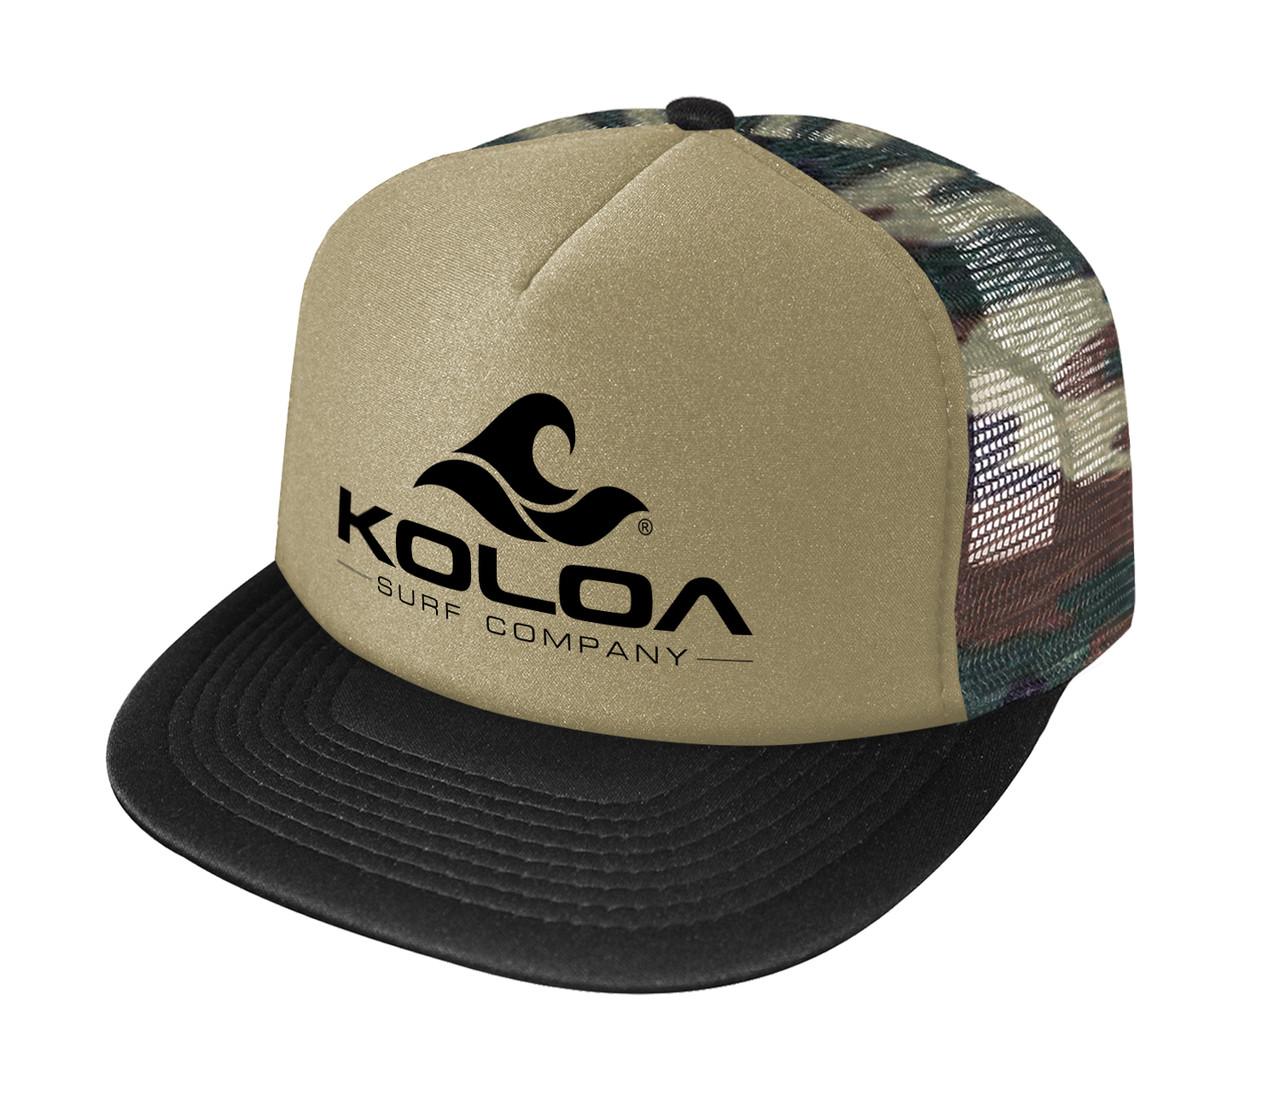 Koloa Surf Co. Wave Logo Poly-Foam Mesh Snapback High Profile ... daf62e30009